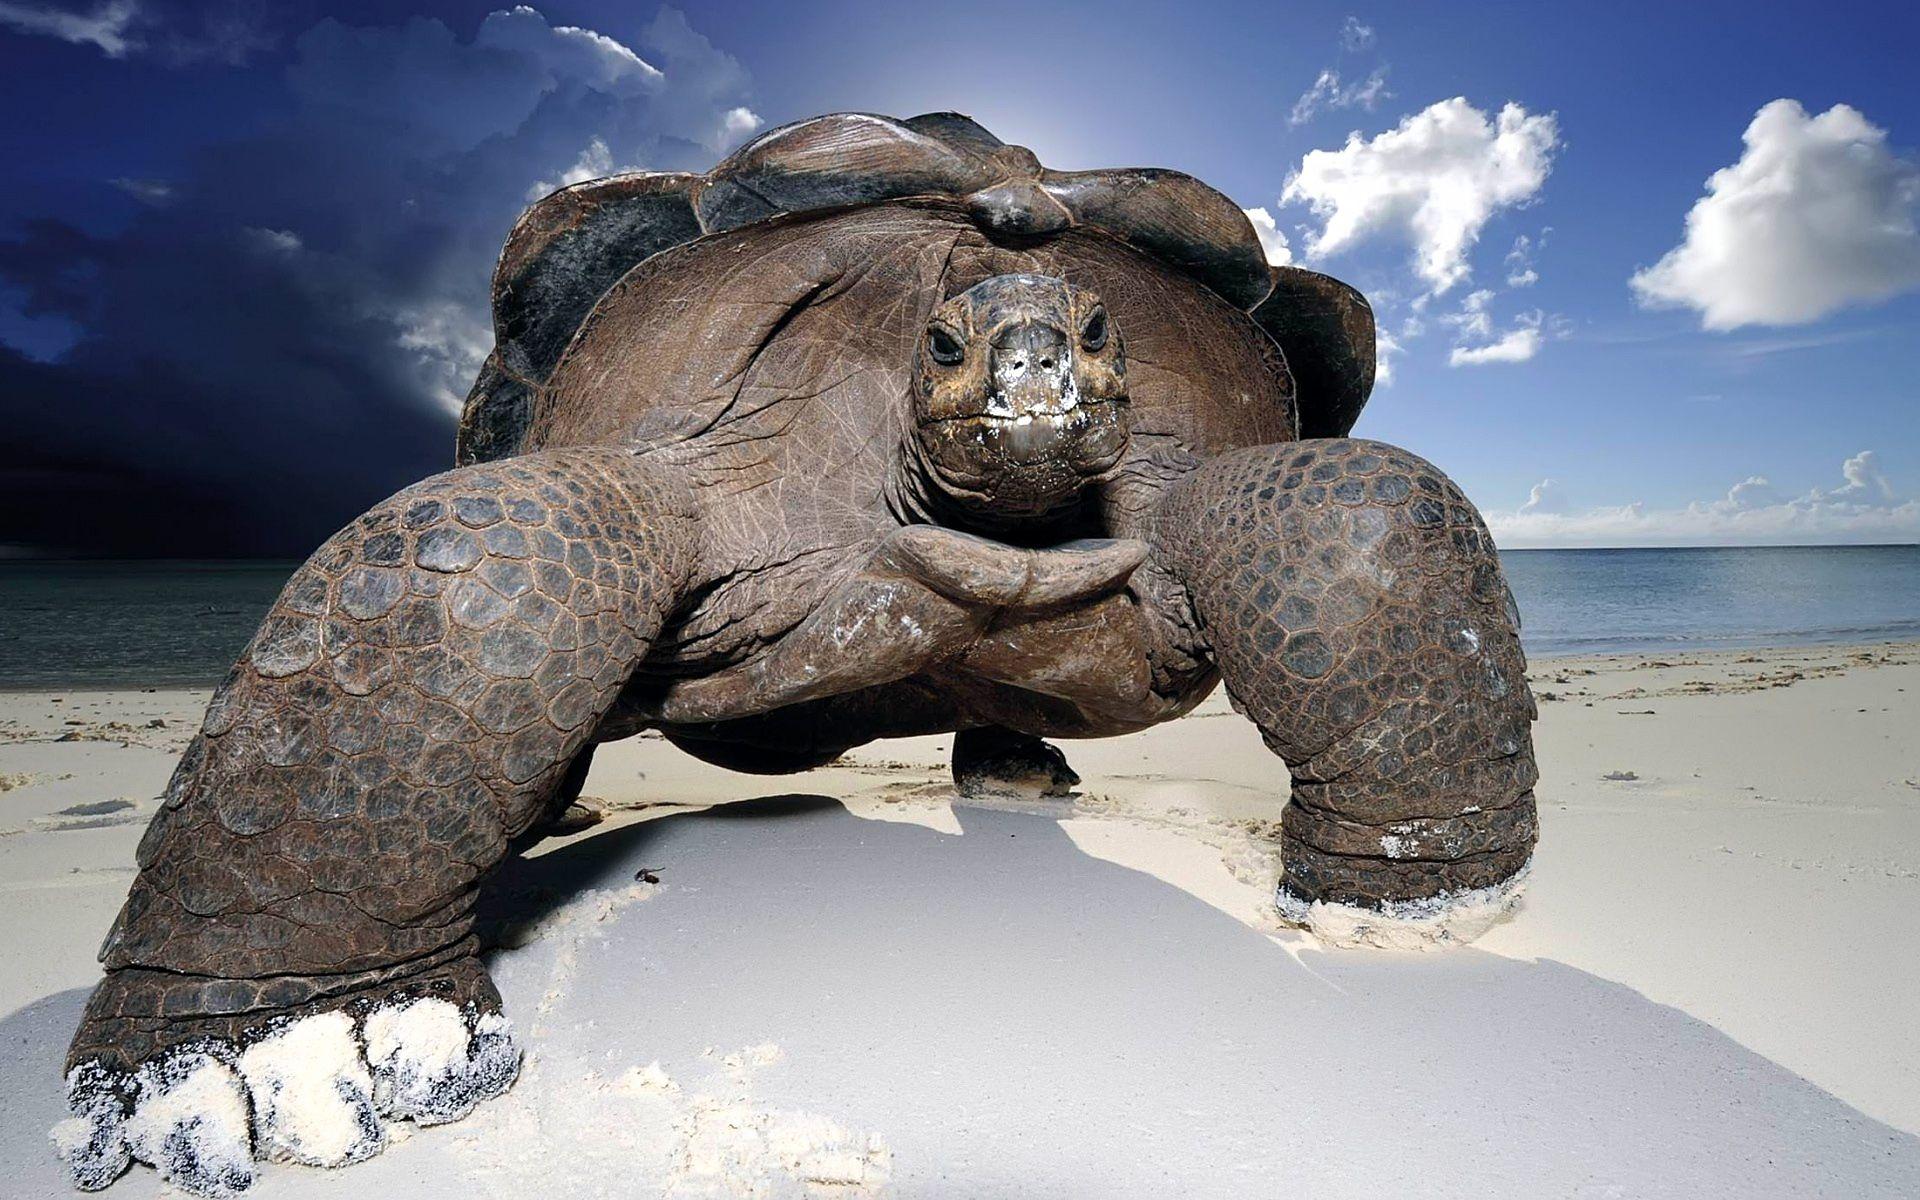 turtles pics hd